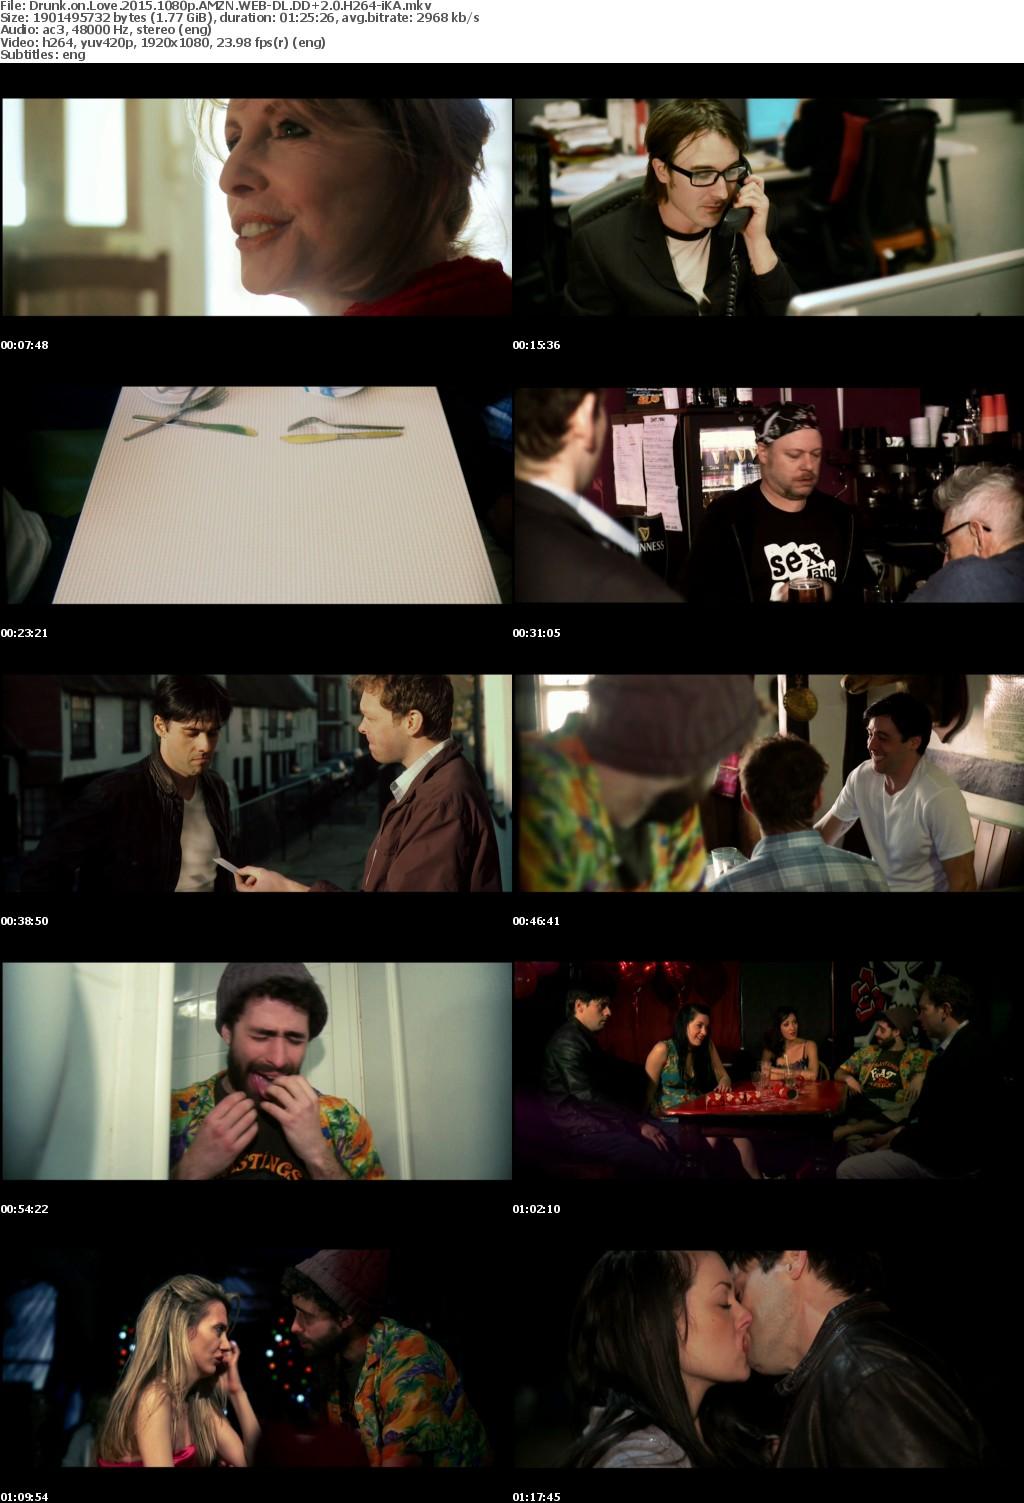 Drunk on Love (2015) 1080p AMZN WEBRip DDP2.0 x264-iKA